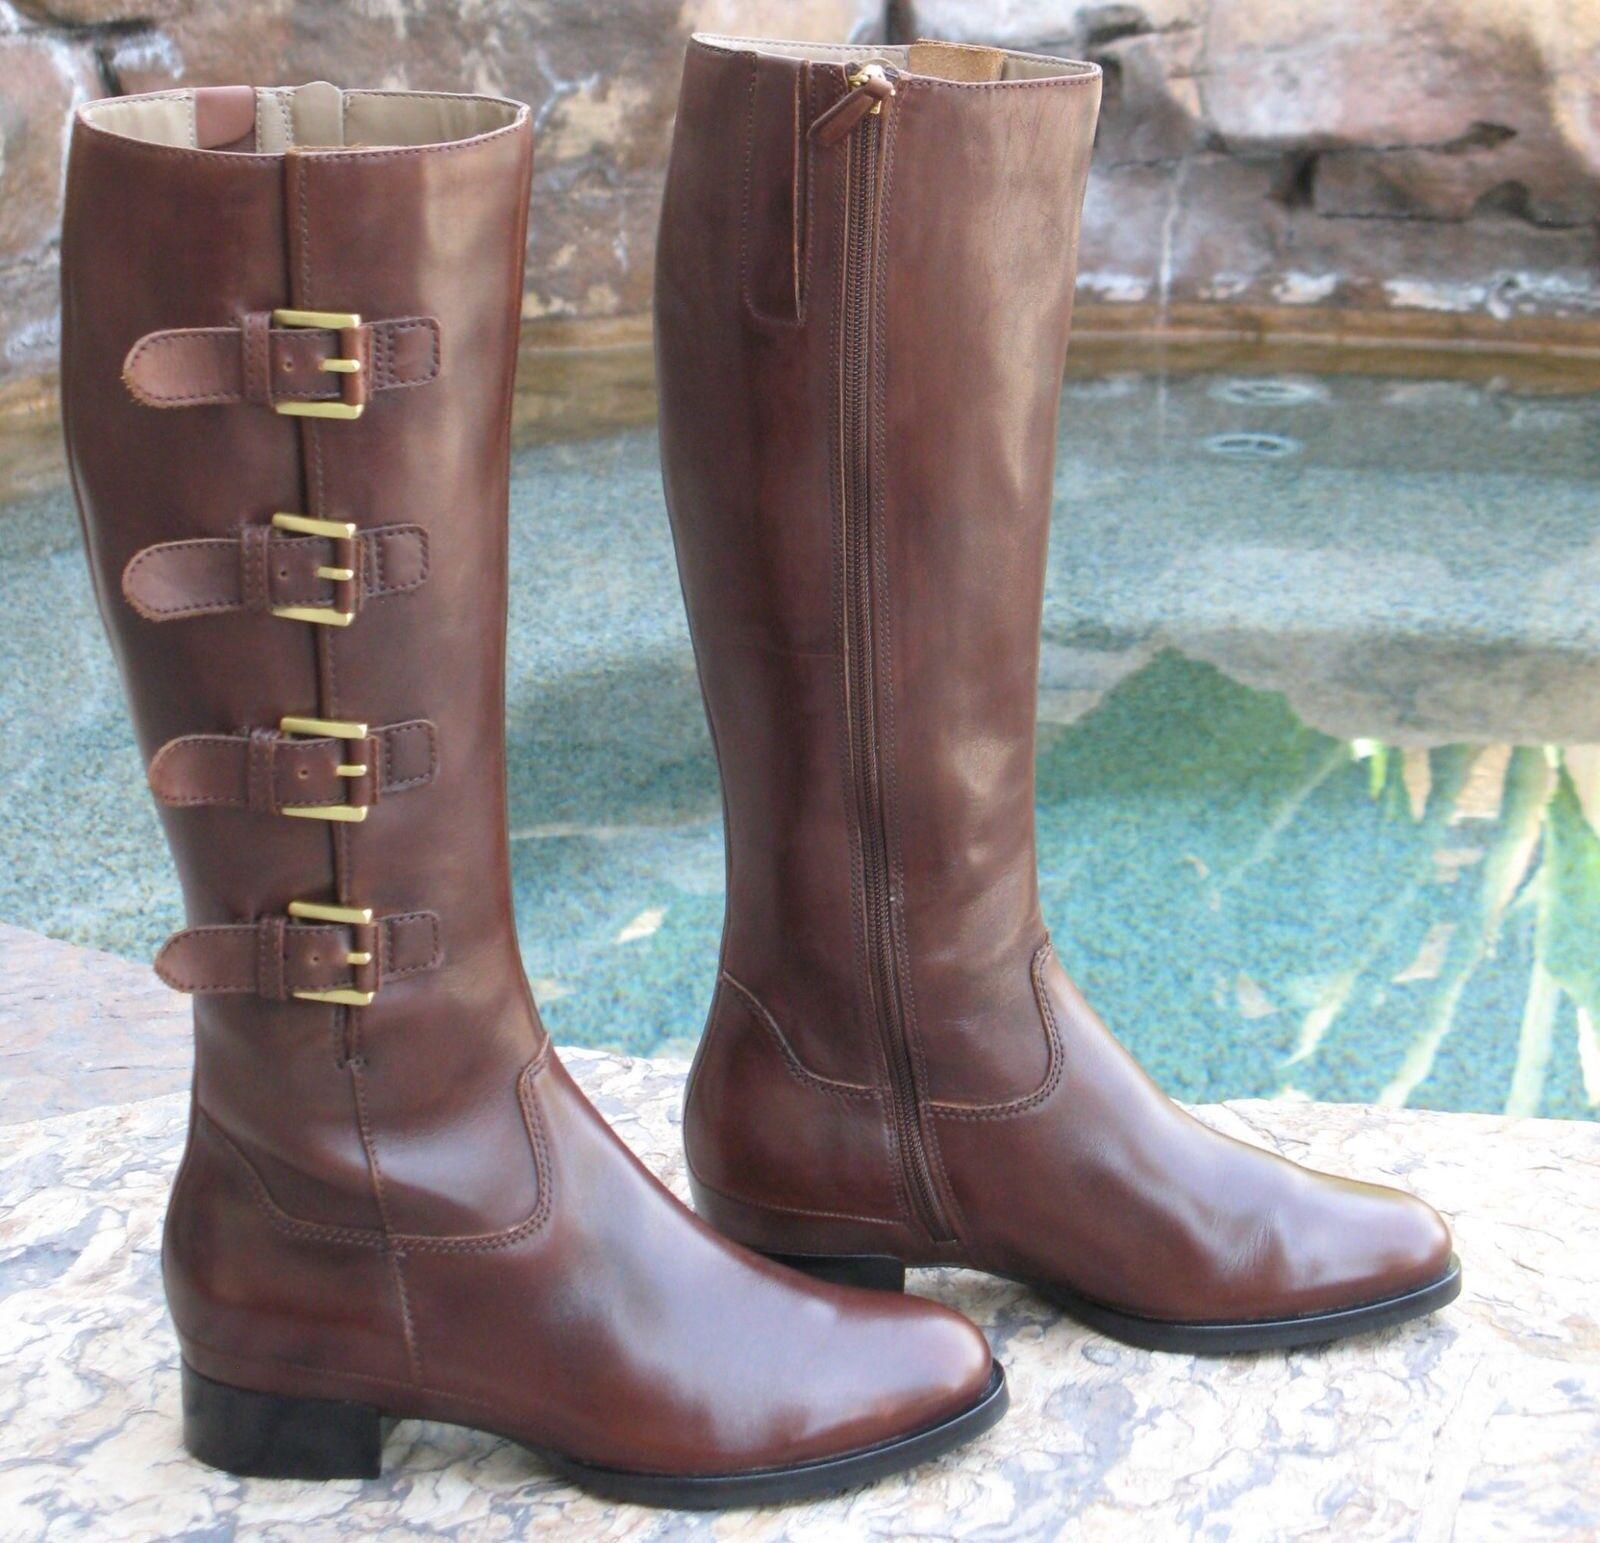 ECCO Sullivan Buckle Riding Boots EUR 37 USA Wmn Sz 6 - 6.5 Knee High  260